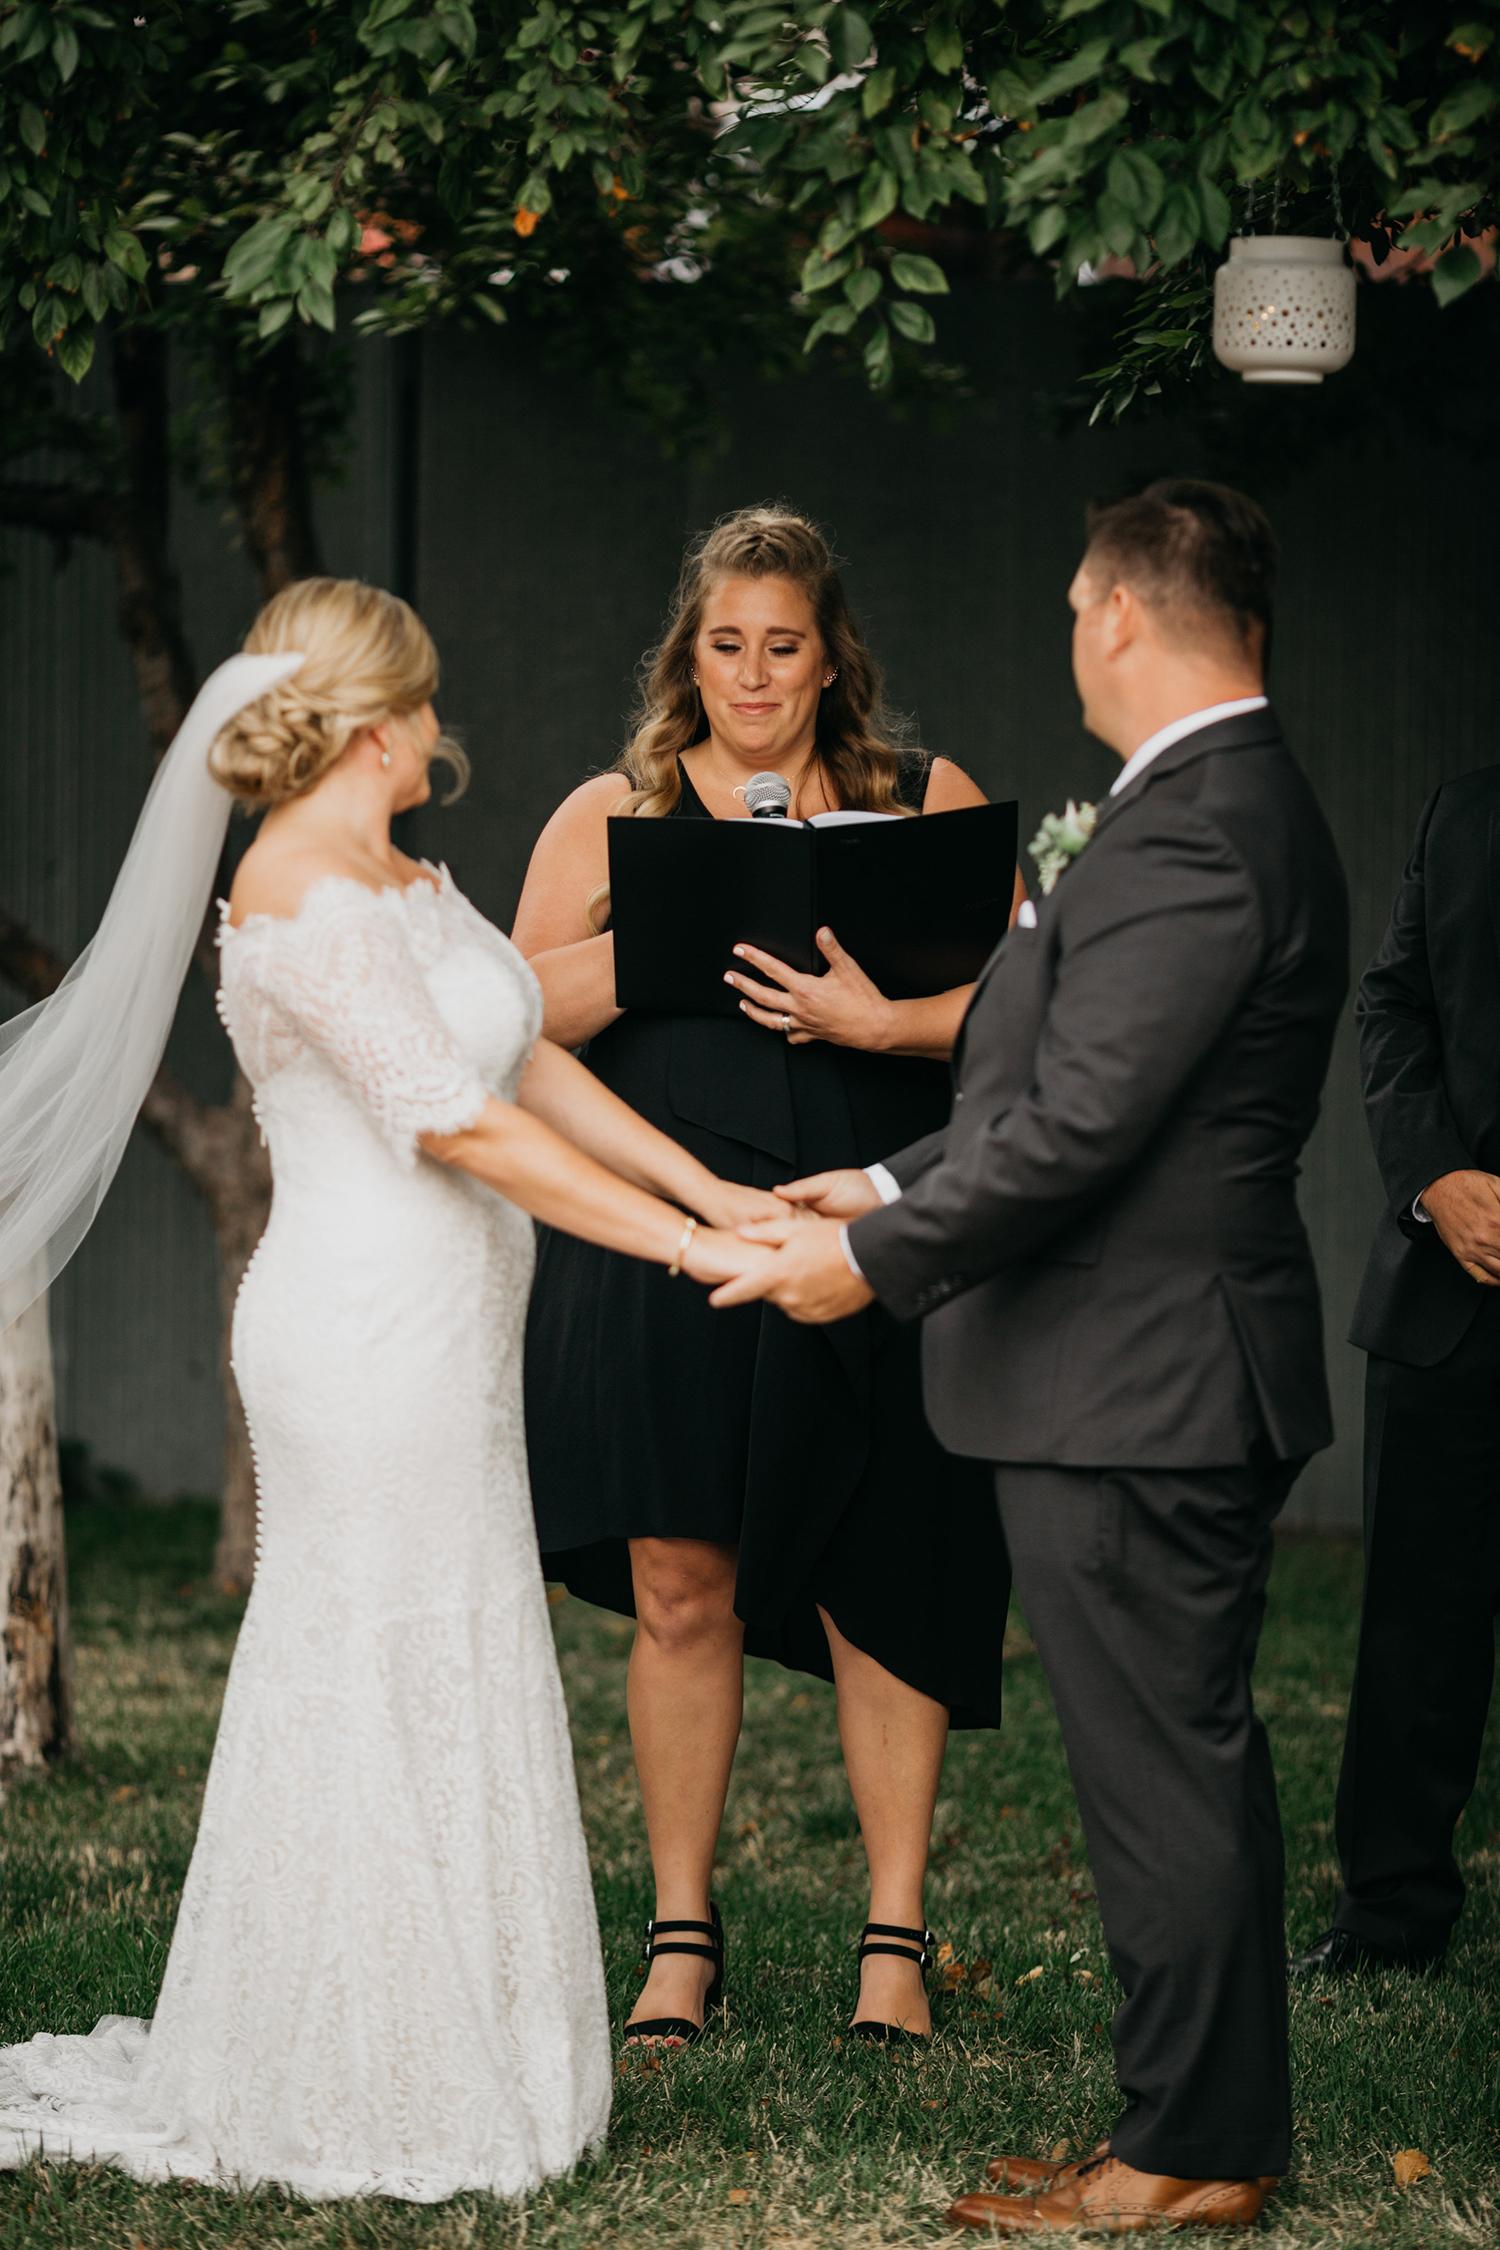 Modern-Black-and-White-Blanc-Denver-Colorado-Wedding-14.jpg